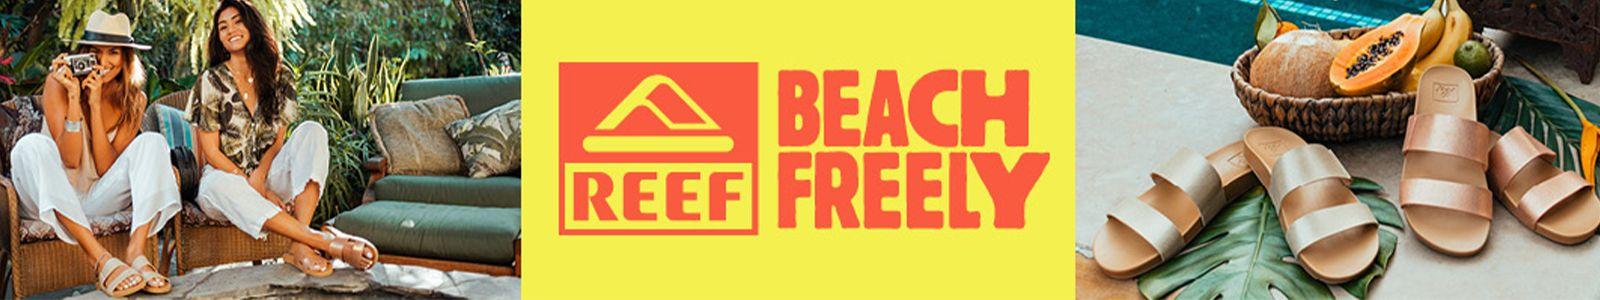 Beach Freely